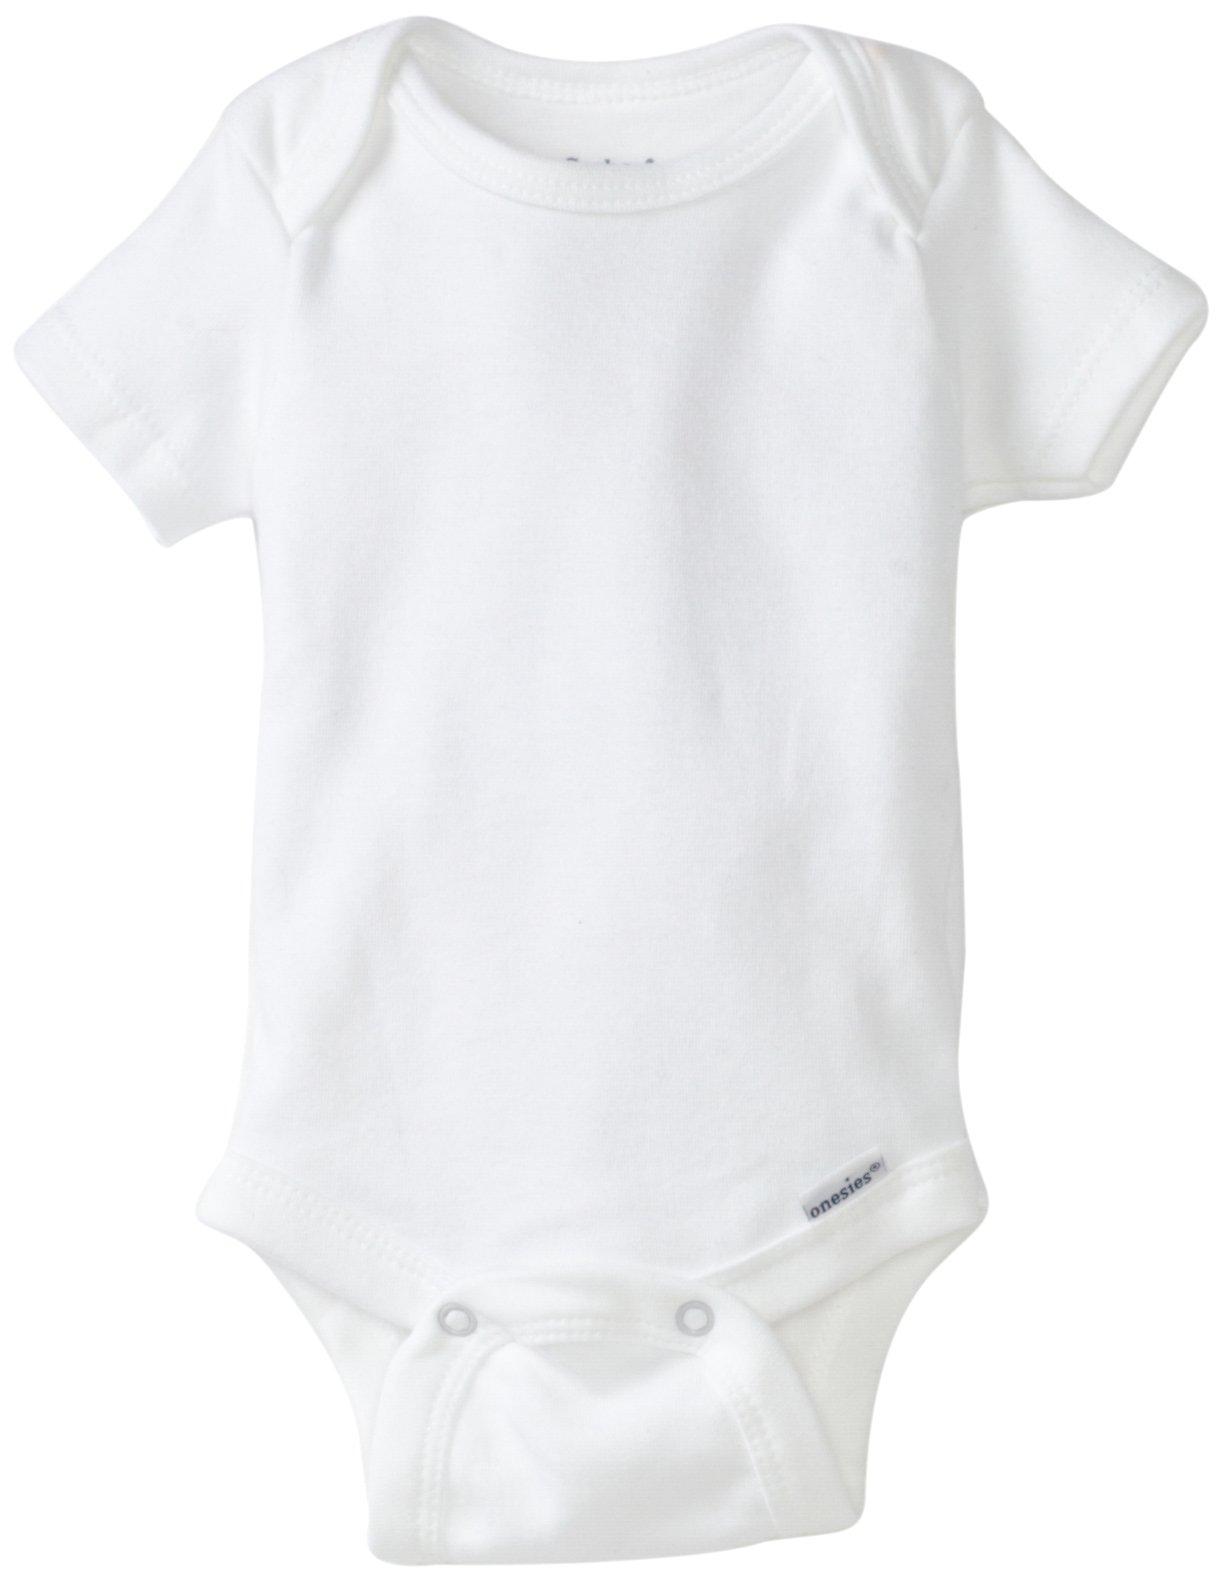 Gerber Brand 4 Pack Organic Bodysuits Brand, White, 0-3 Months